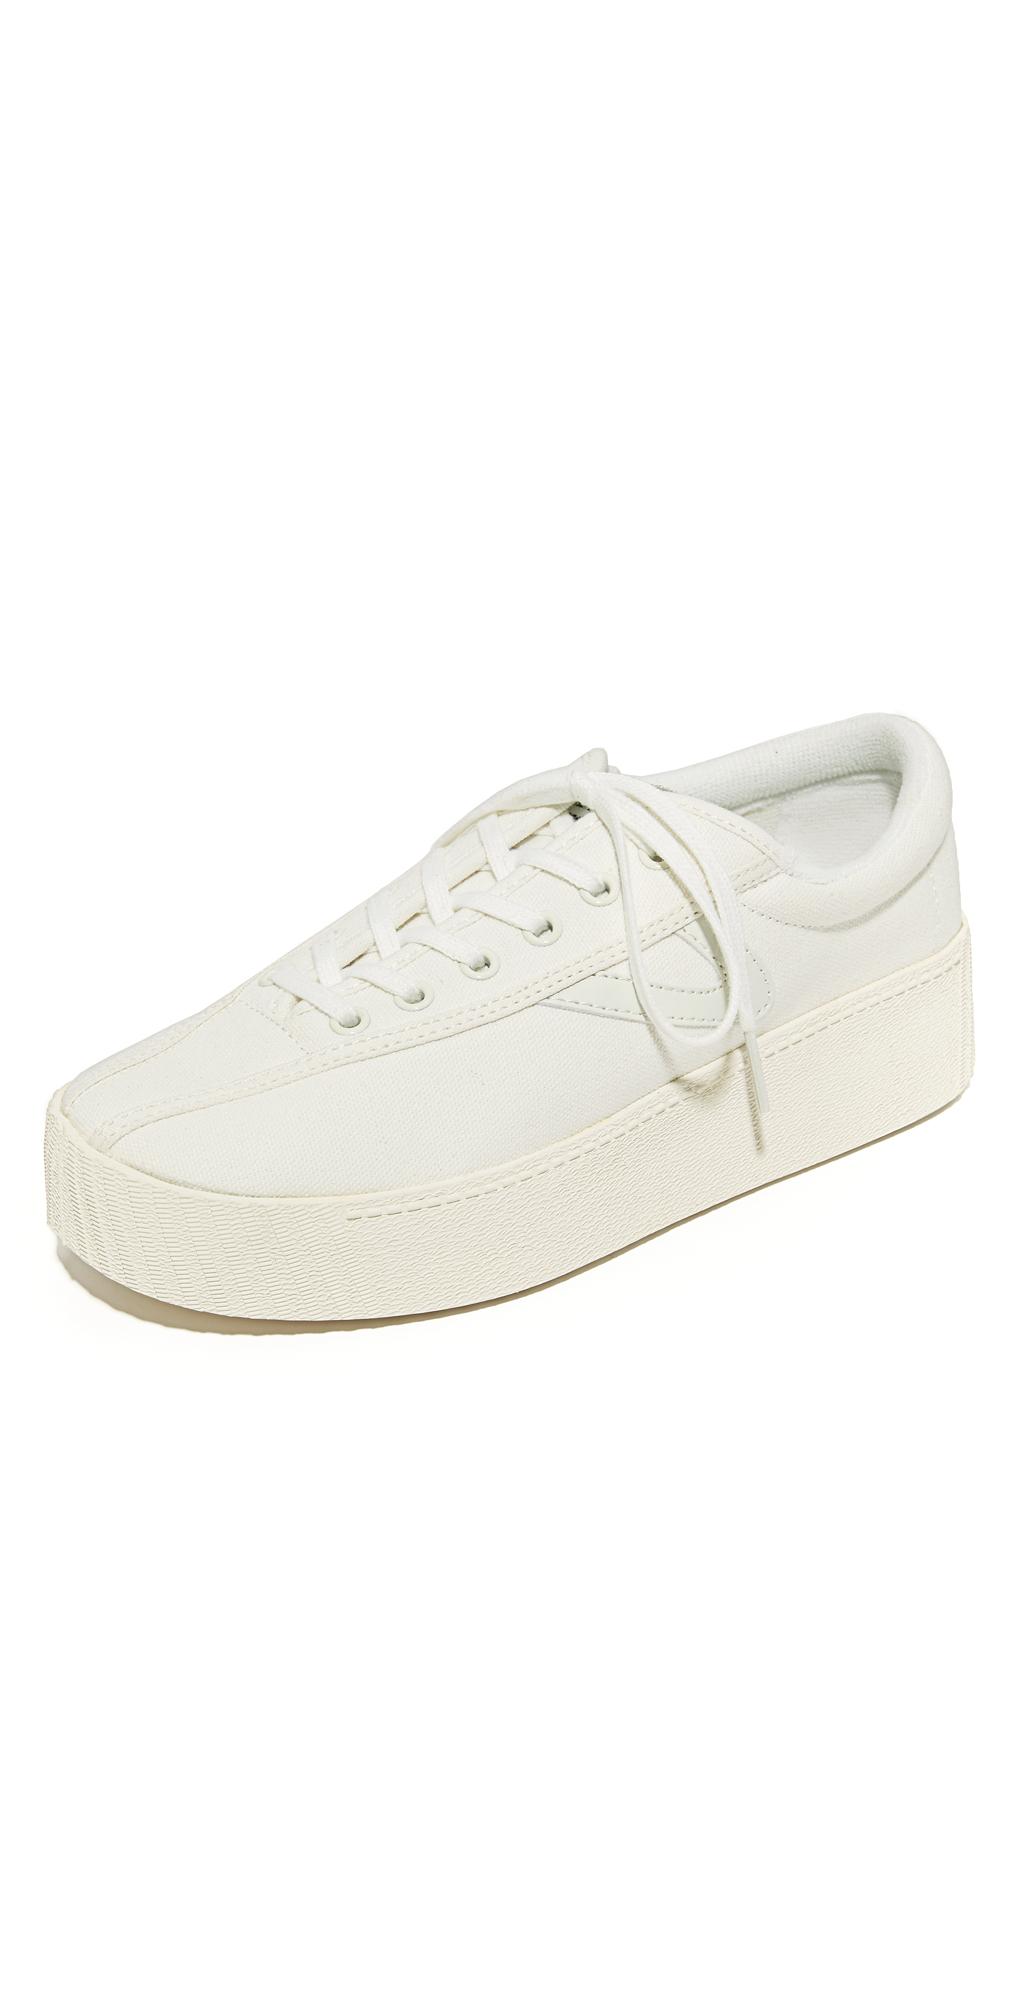 Nylite Bold Platform Classic Sneakers Tretorn